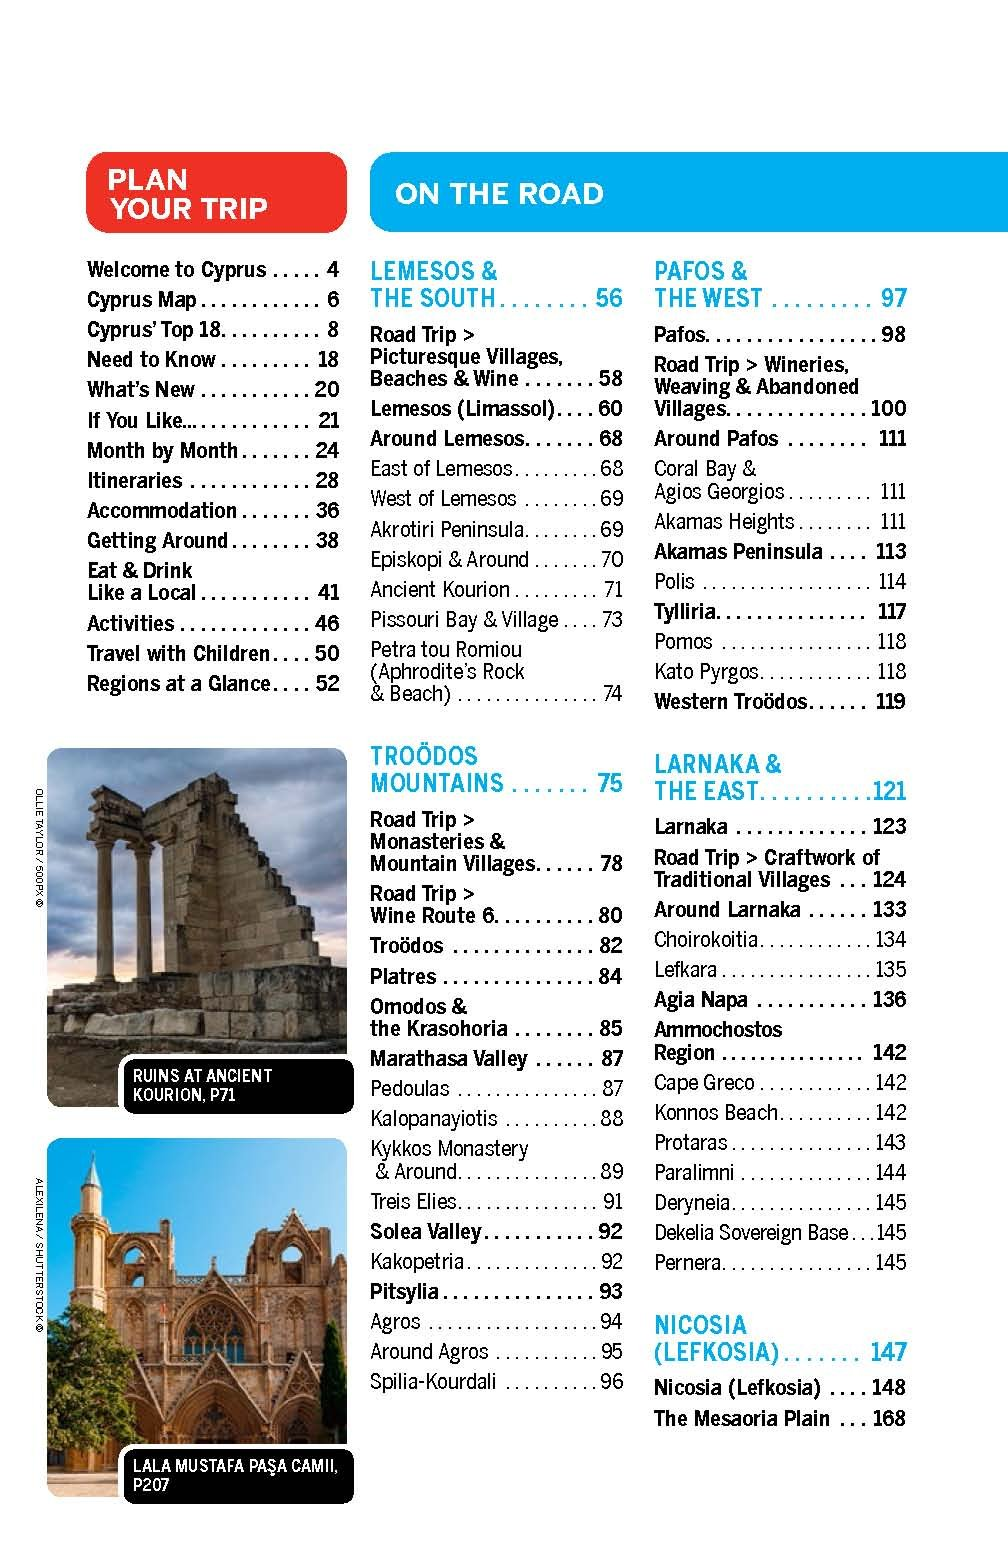 18fd6403e6117 Lonely Planet Cyprus (Travel Guide): Amazon.co.uk: Lonely Planet, Jessica  Lee, Joe Bindloss, Josephine Quintero: 9781786573490: Books